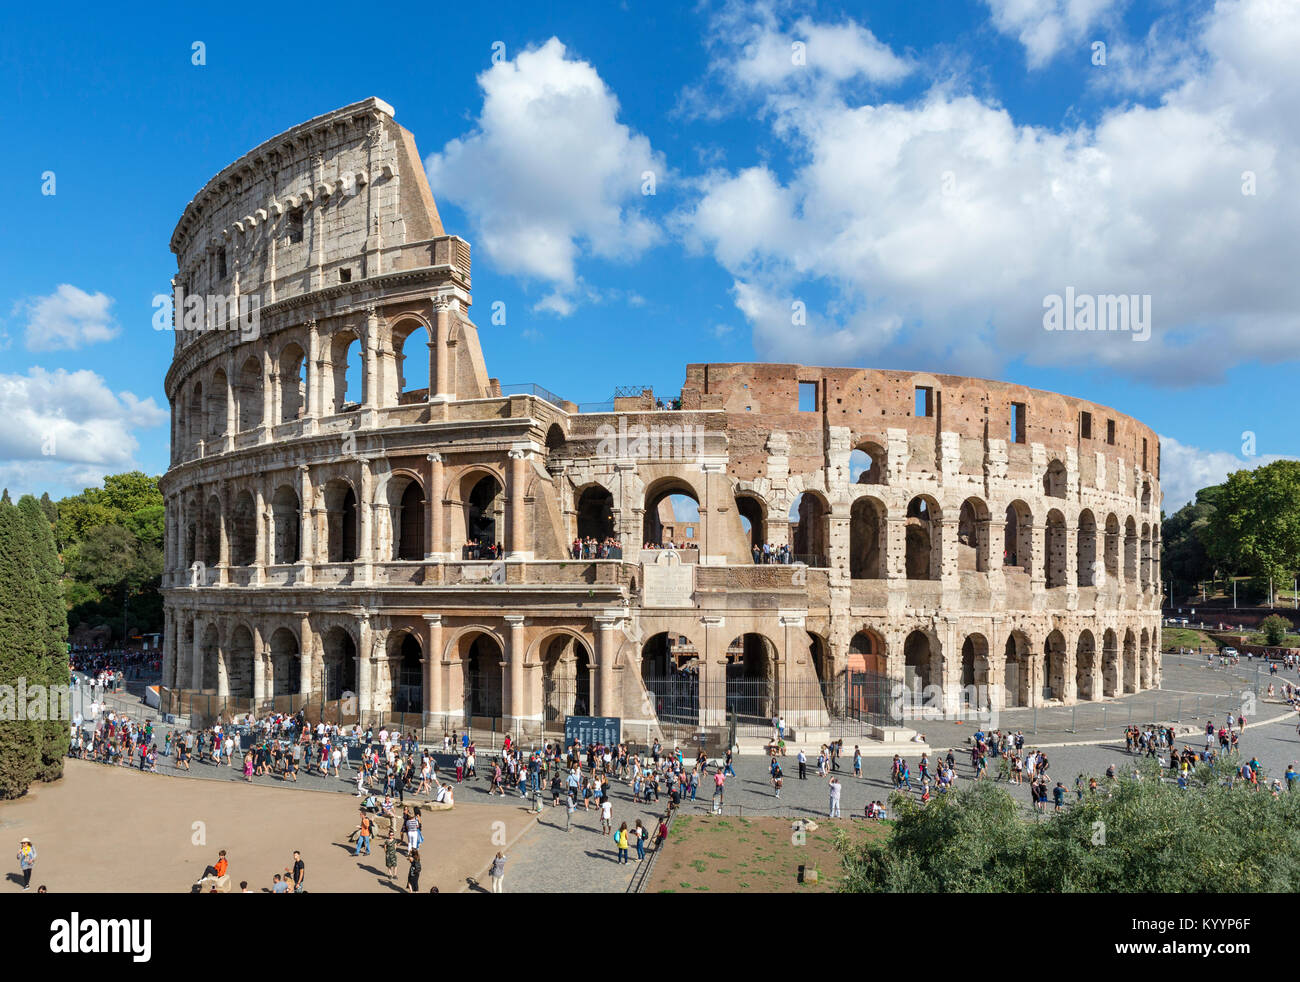 The Roman Colosseum, Rome, Italy - Stock Image